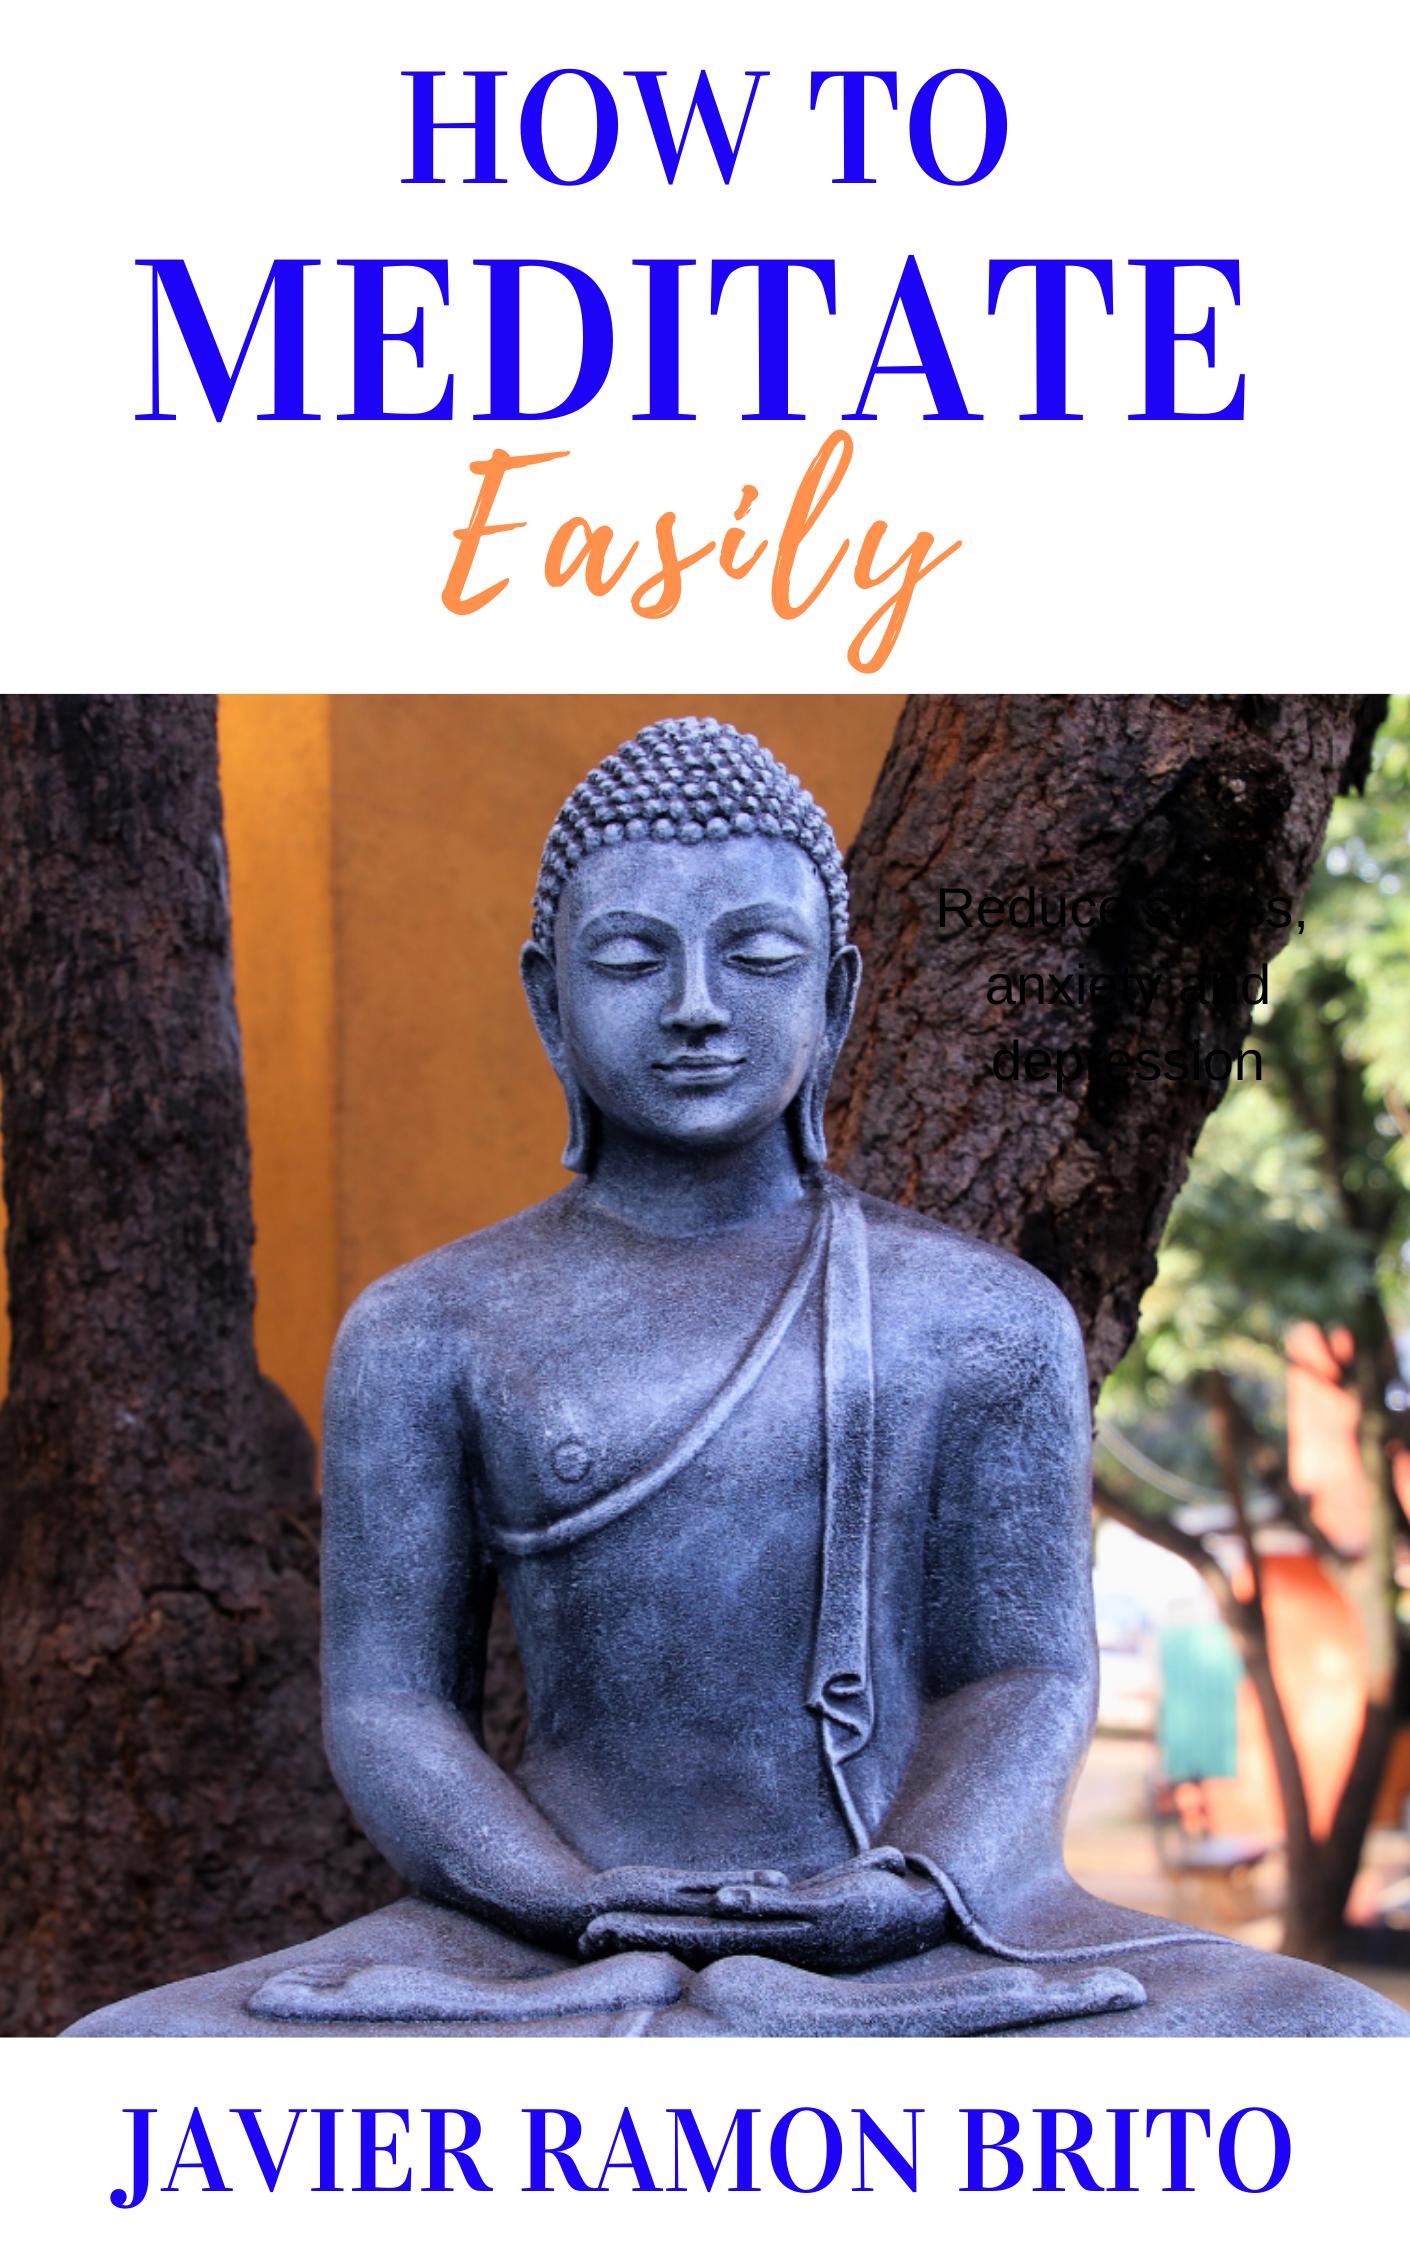 meditate, meditation, meditate easily, meditation book, guide to meditation, meditation techniques, download meditation guide